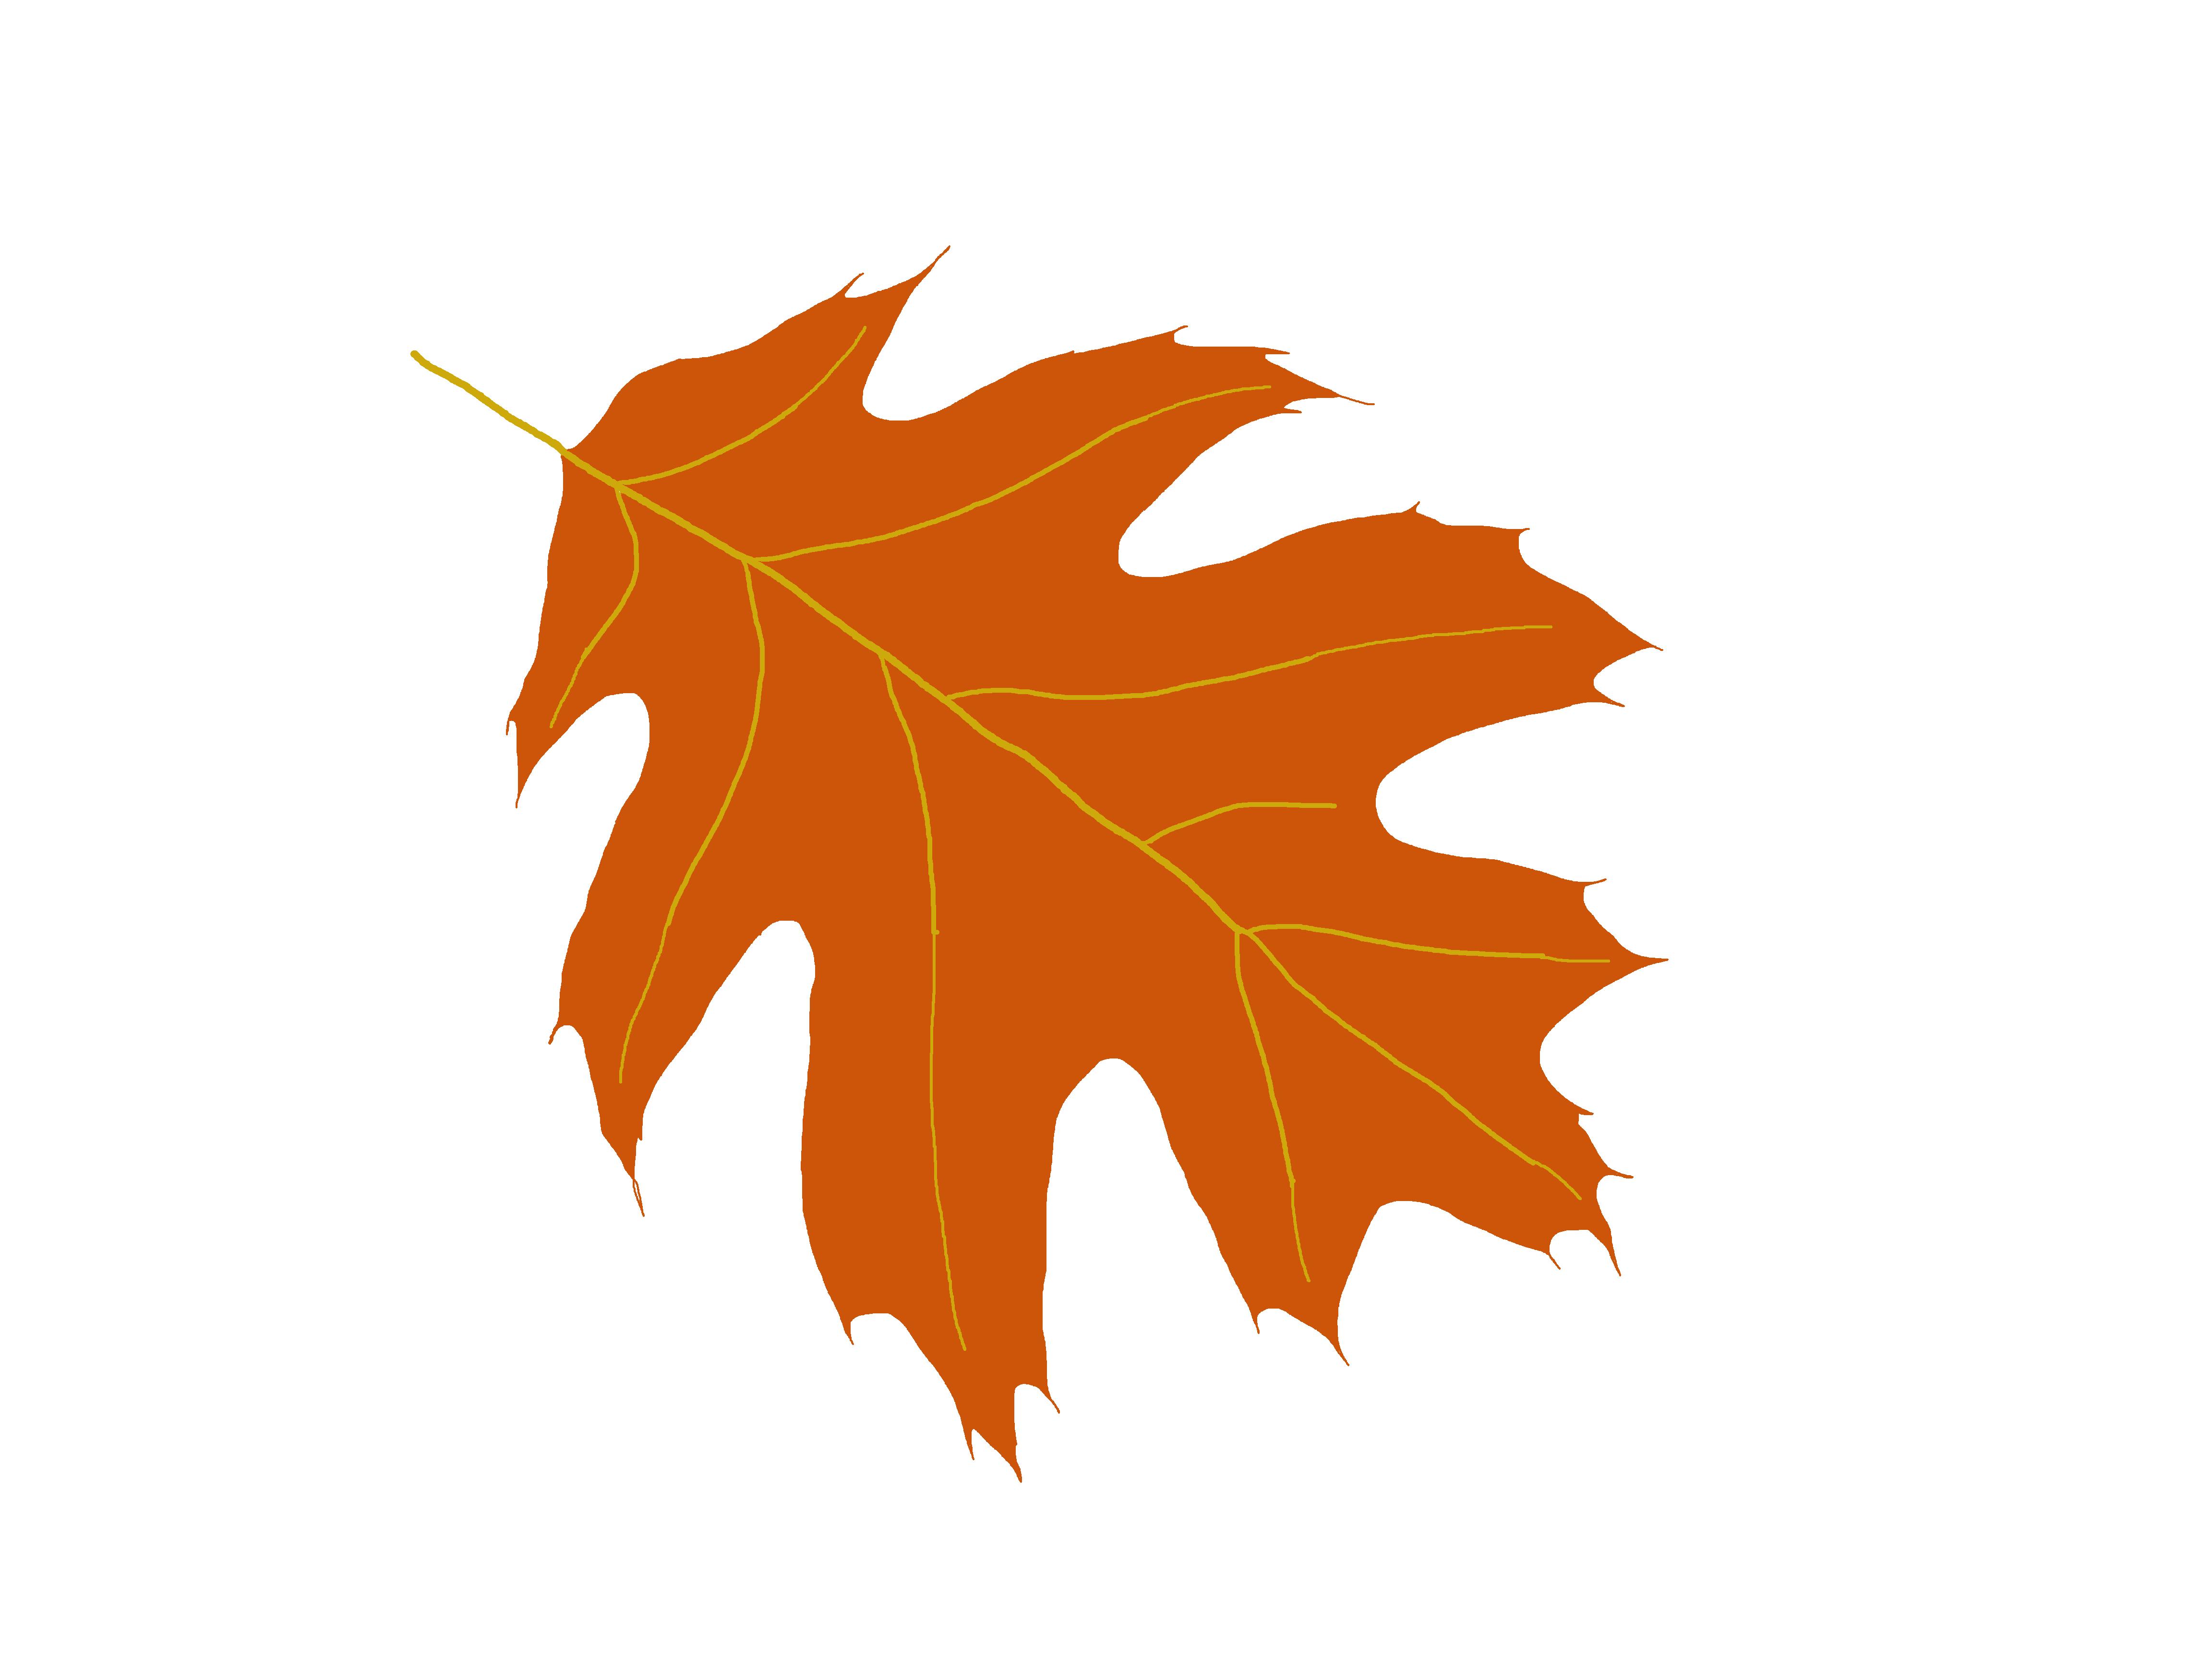 4608x3456 Clip Art Oak Leaf Images Clip Art